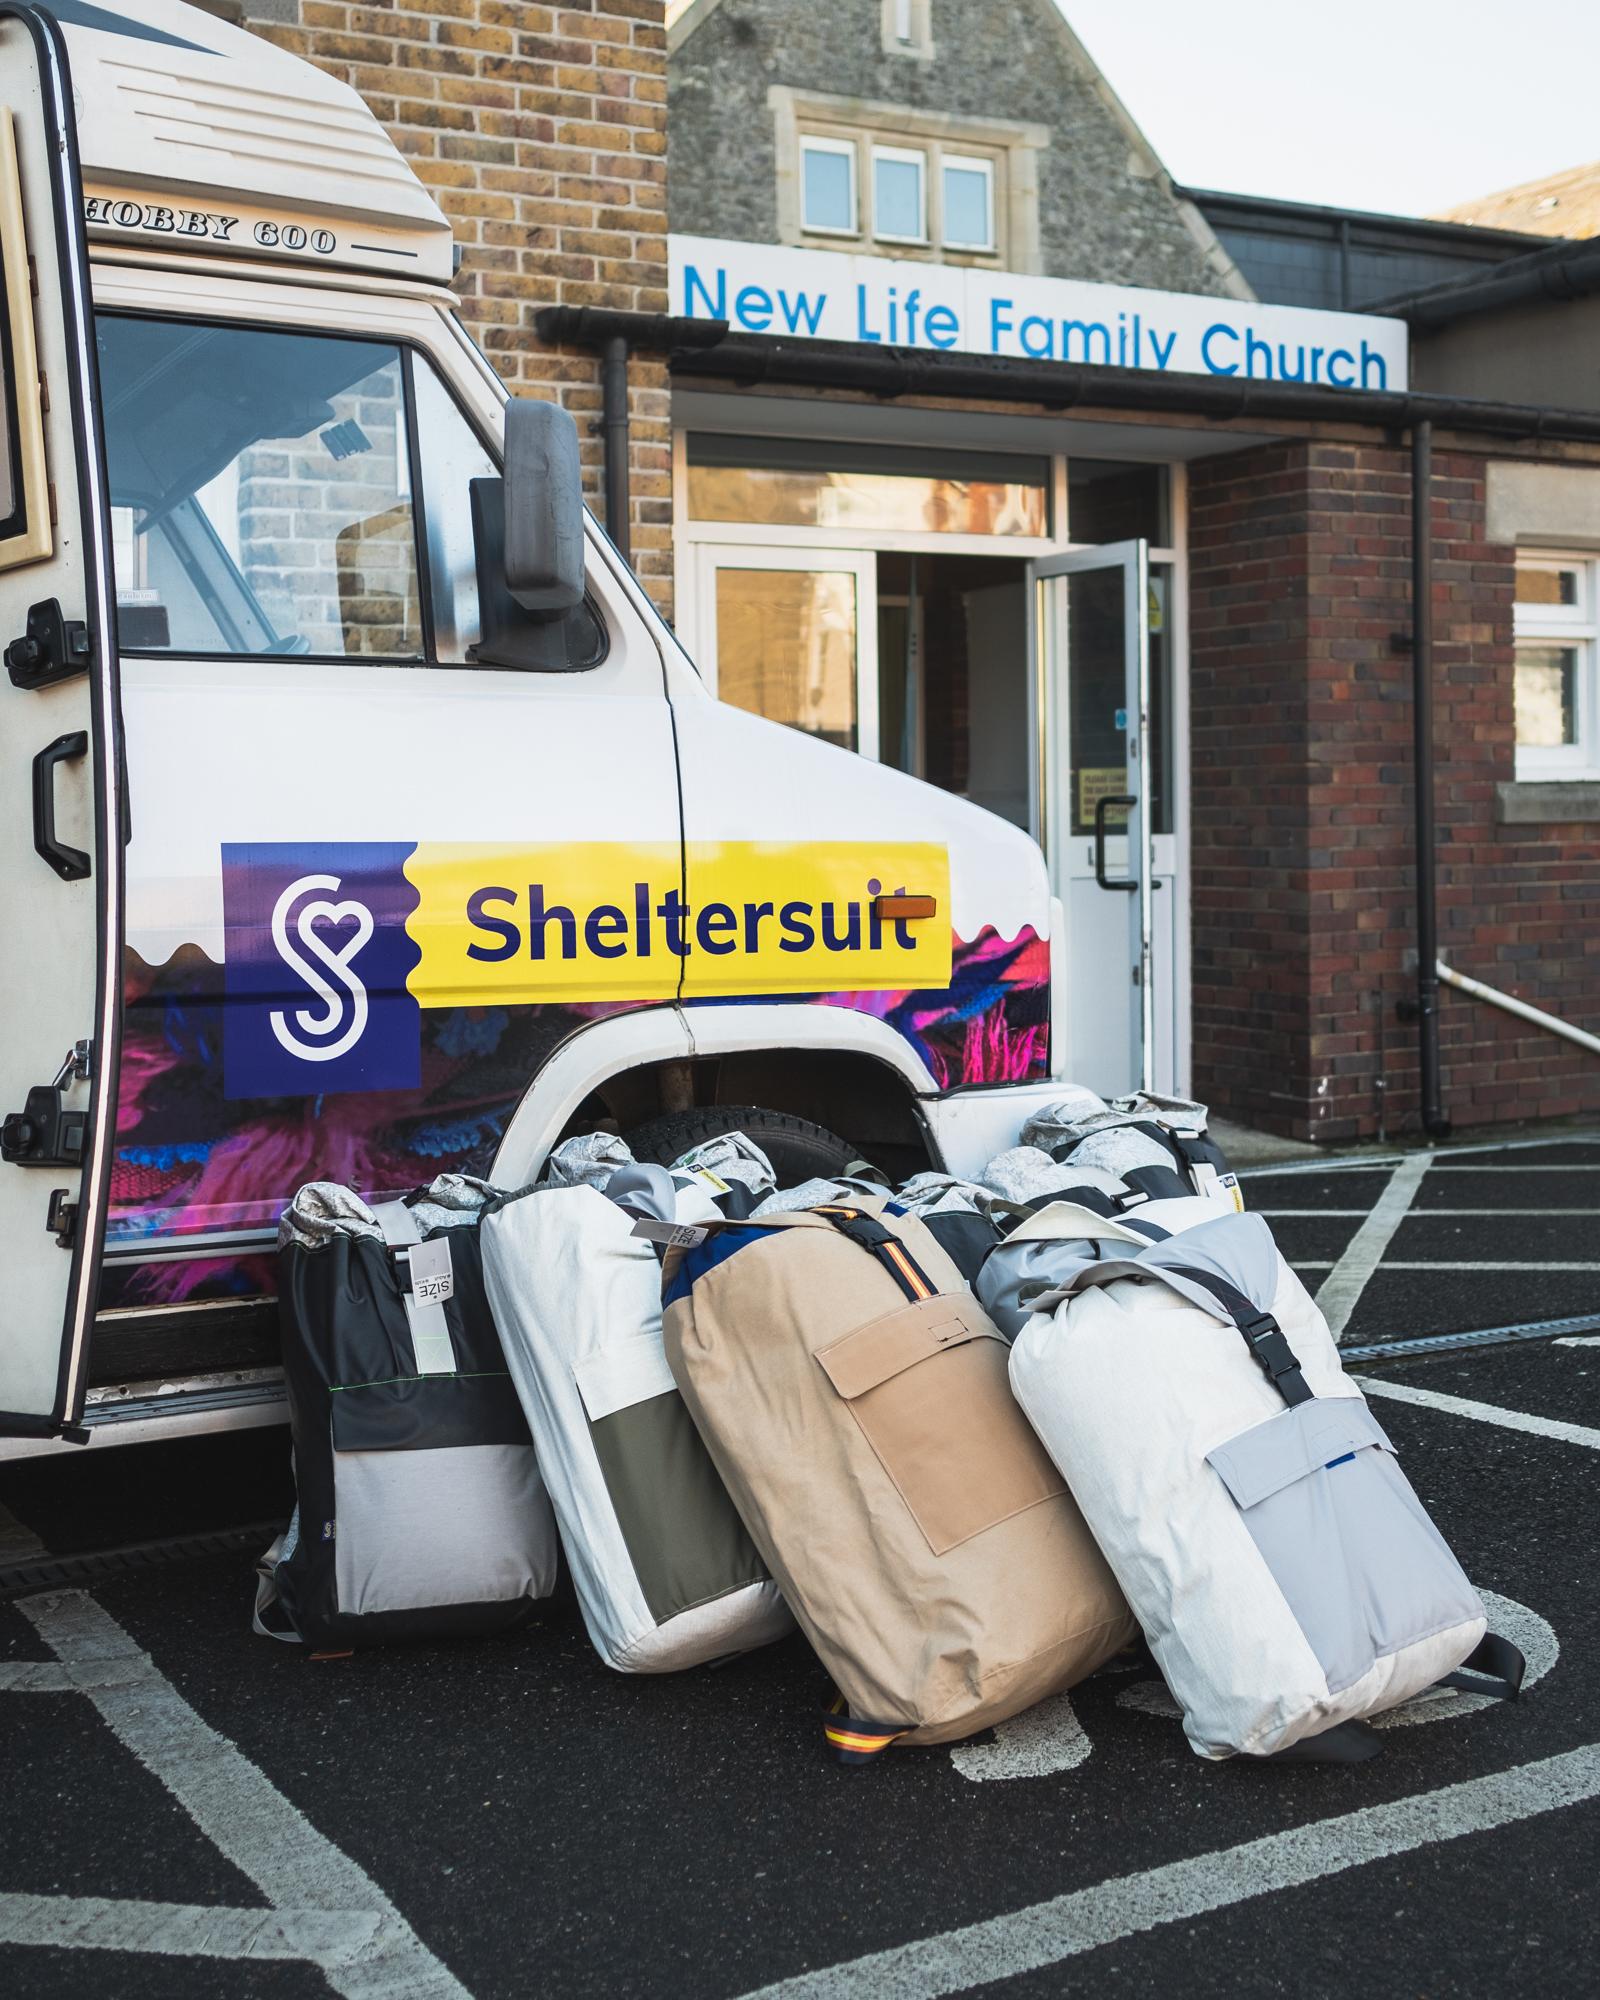 Great-Britain second stop on European Sheltersuit Tour